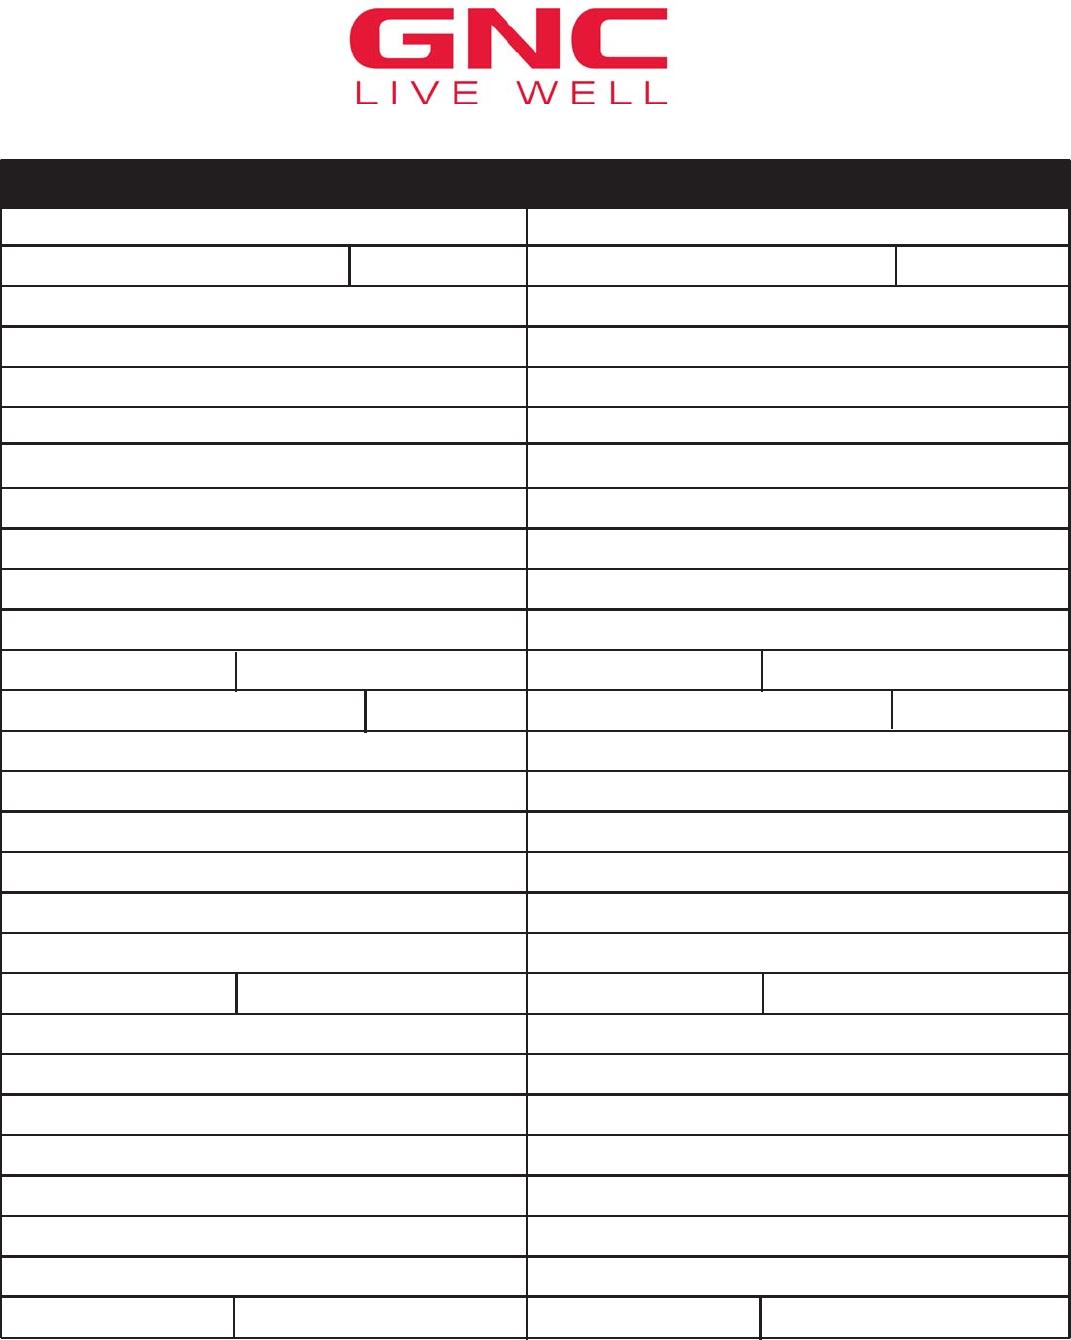 Free Printable GNC Job Application Form Page 5